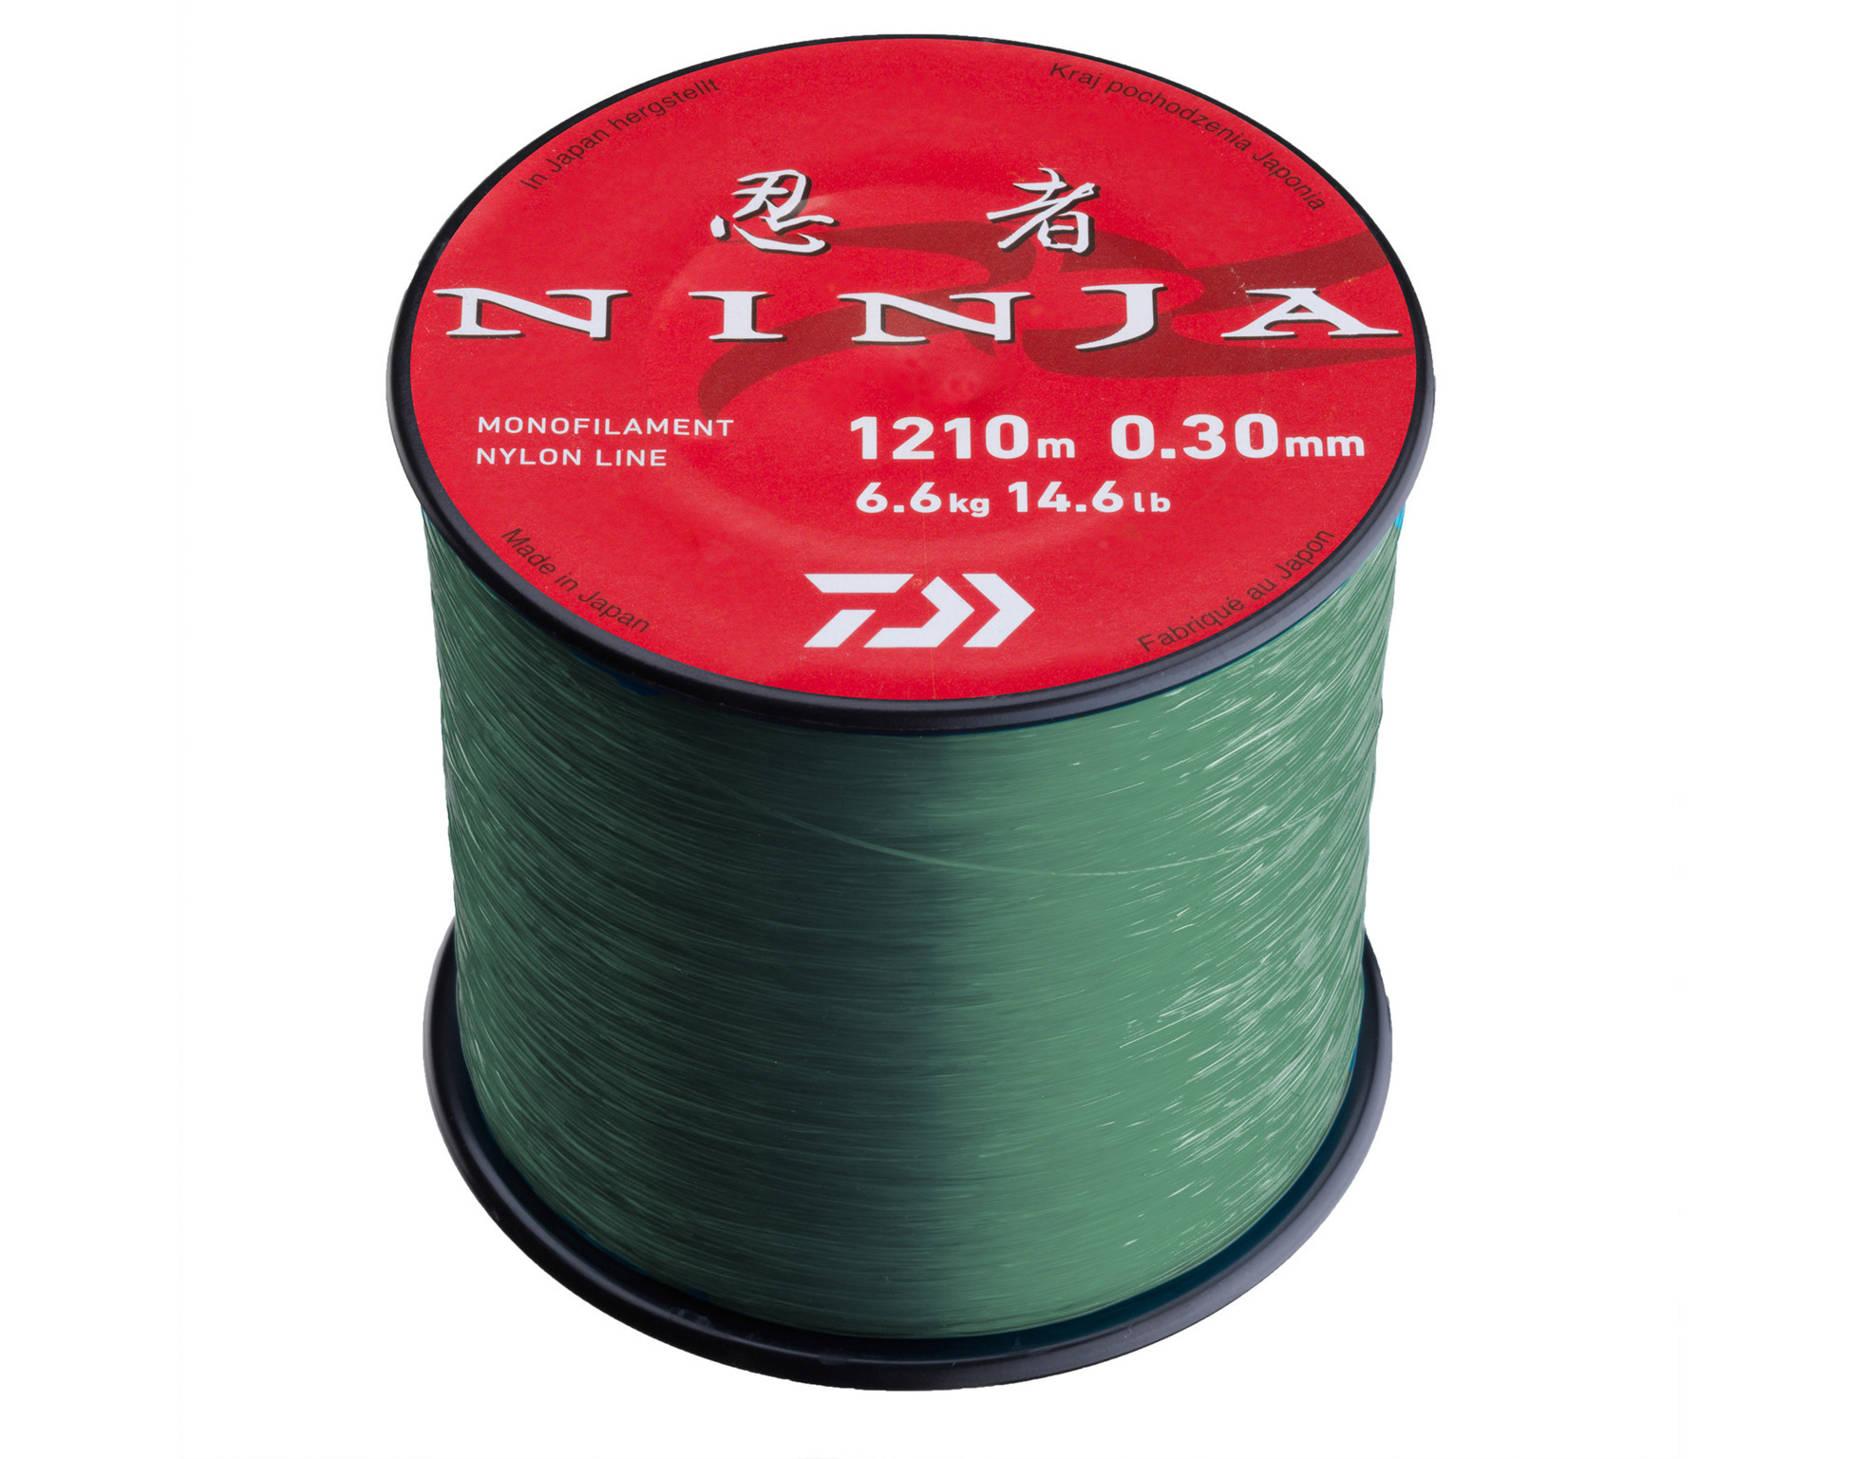 Daiwa ¯y³ka Ninja X Mono - 1850m 0.26mm 4.7kg